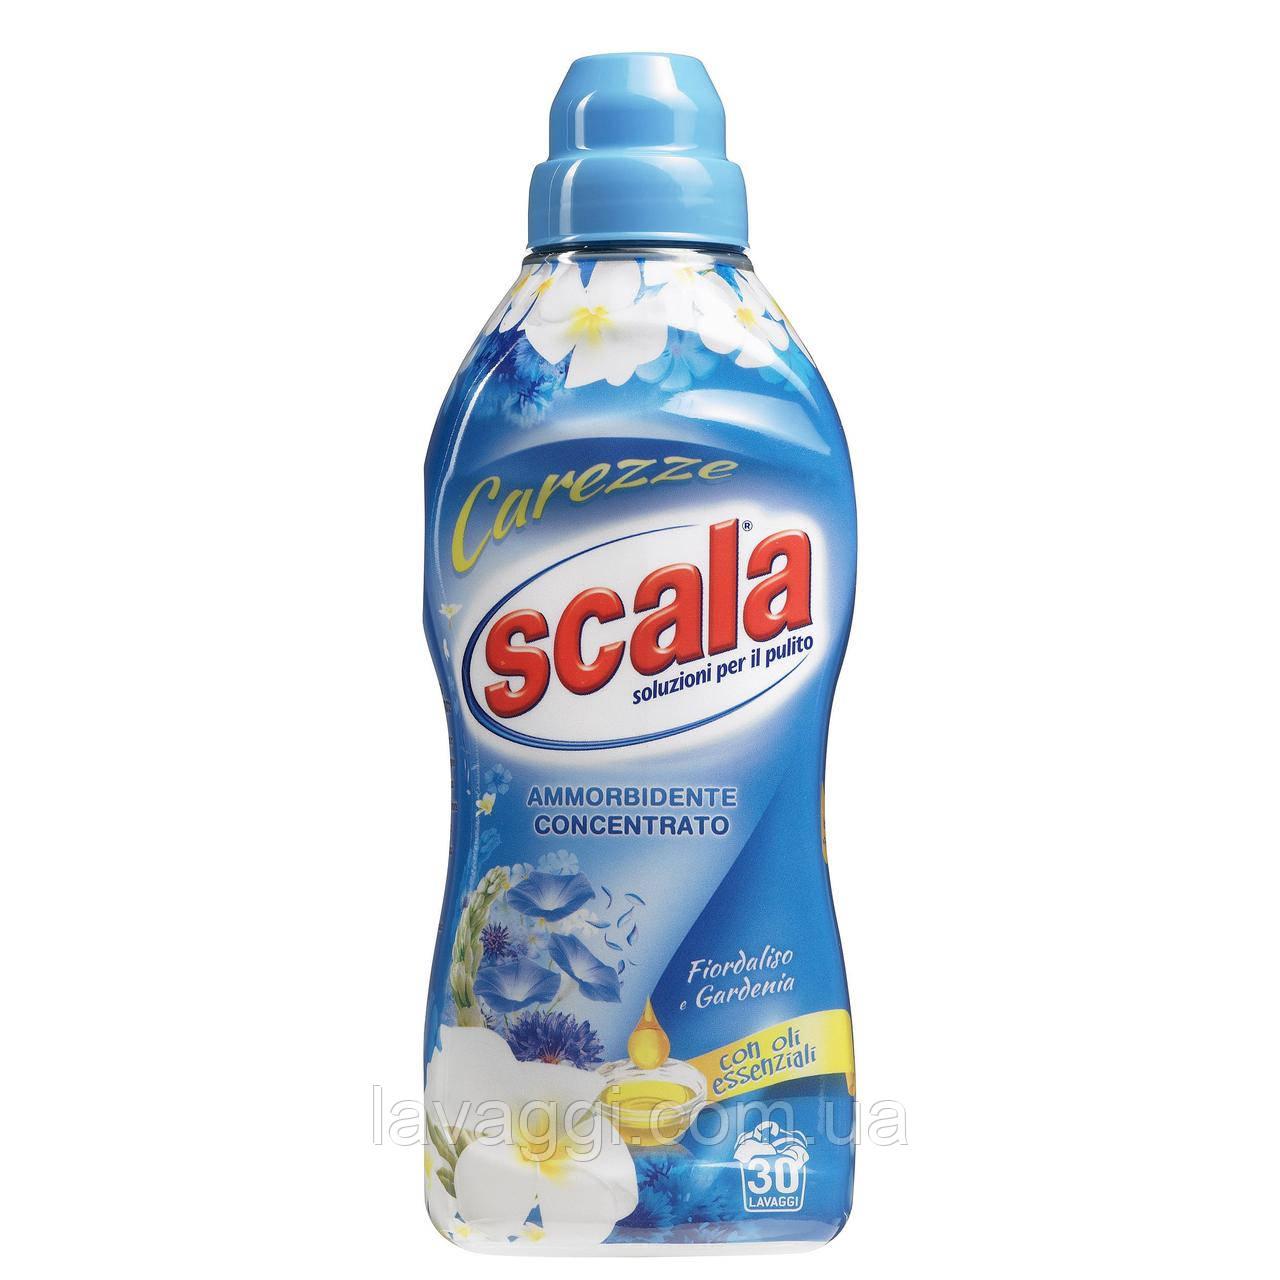 Концентрированный кондиционер-ополаскиватель Scala Ammorbidente concentreato Fiordalisio $ Gardenia 750 ml